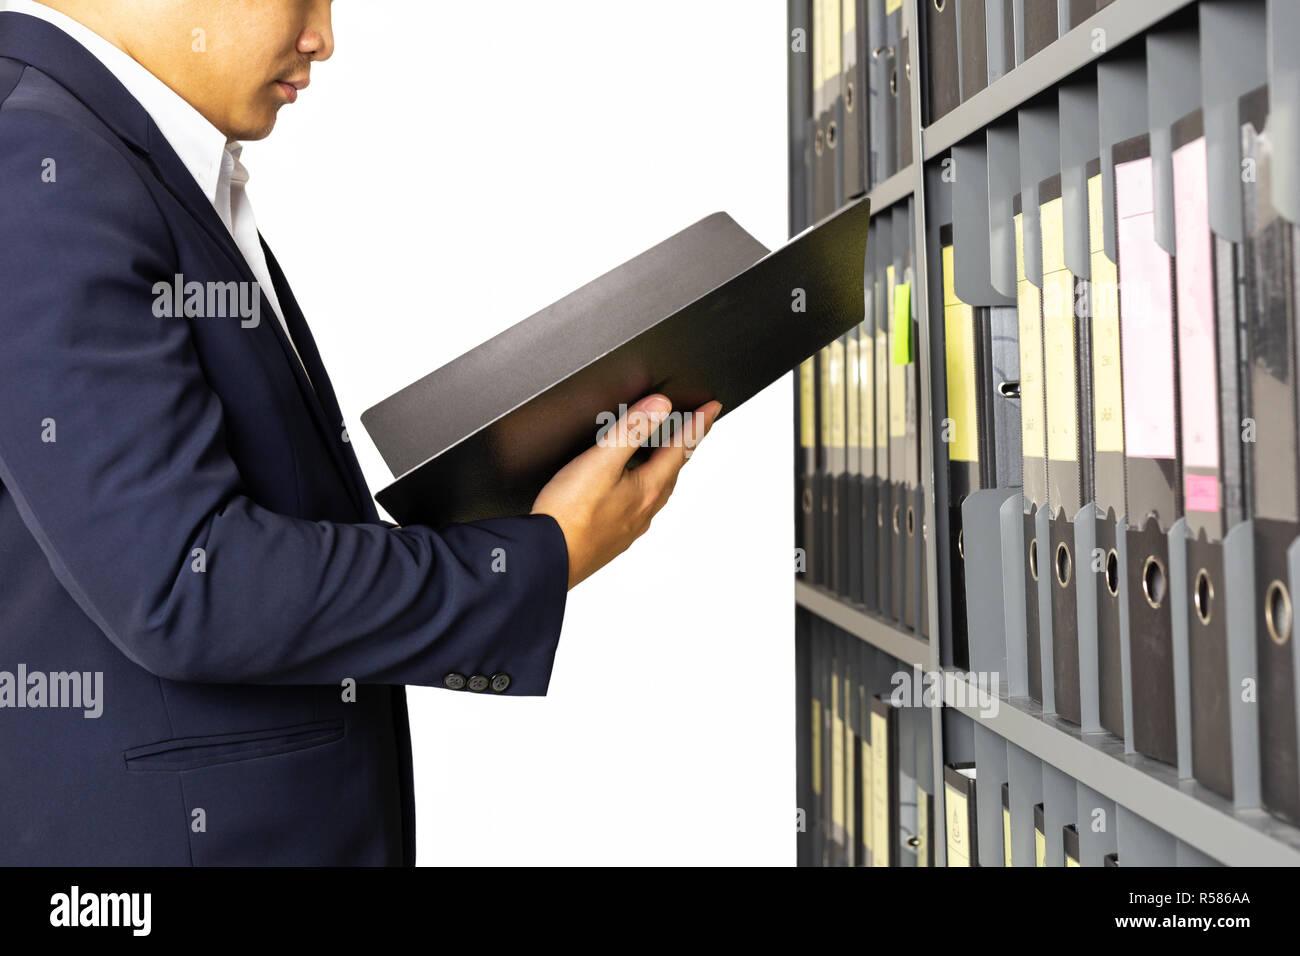 Businessman holding documents file folder from office shelf isolated. - Stock Image